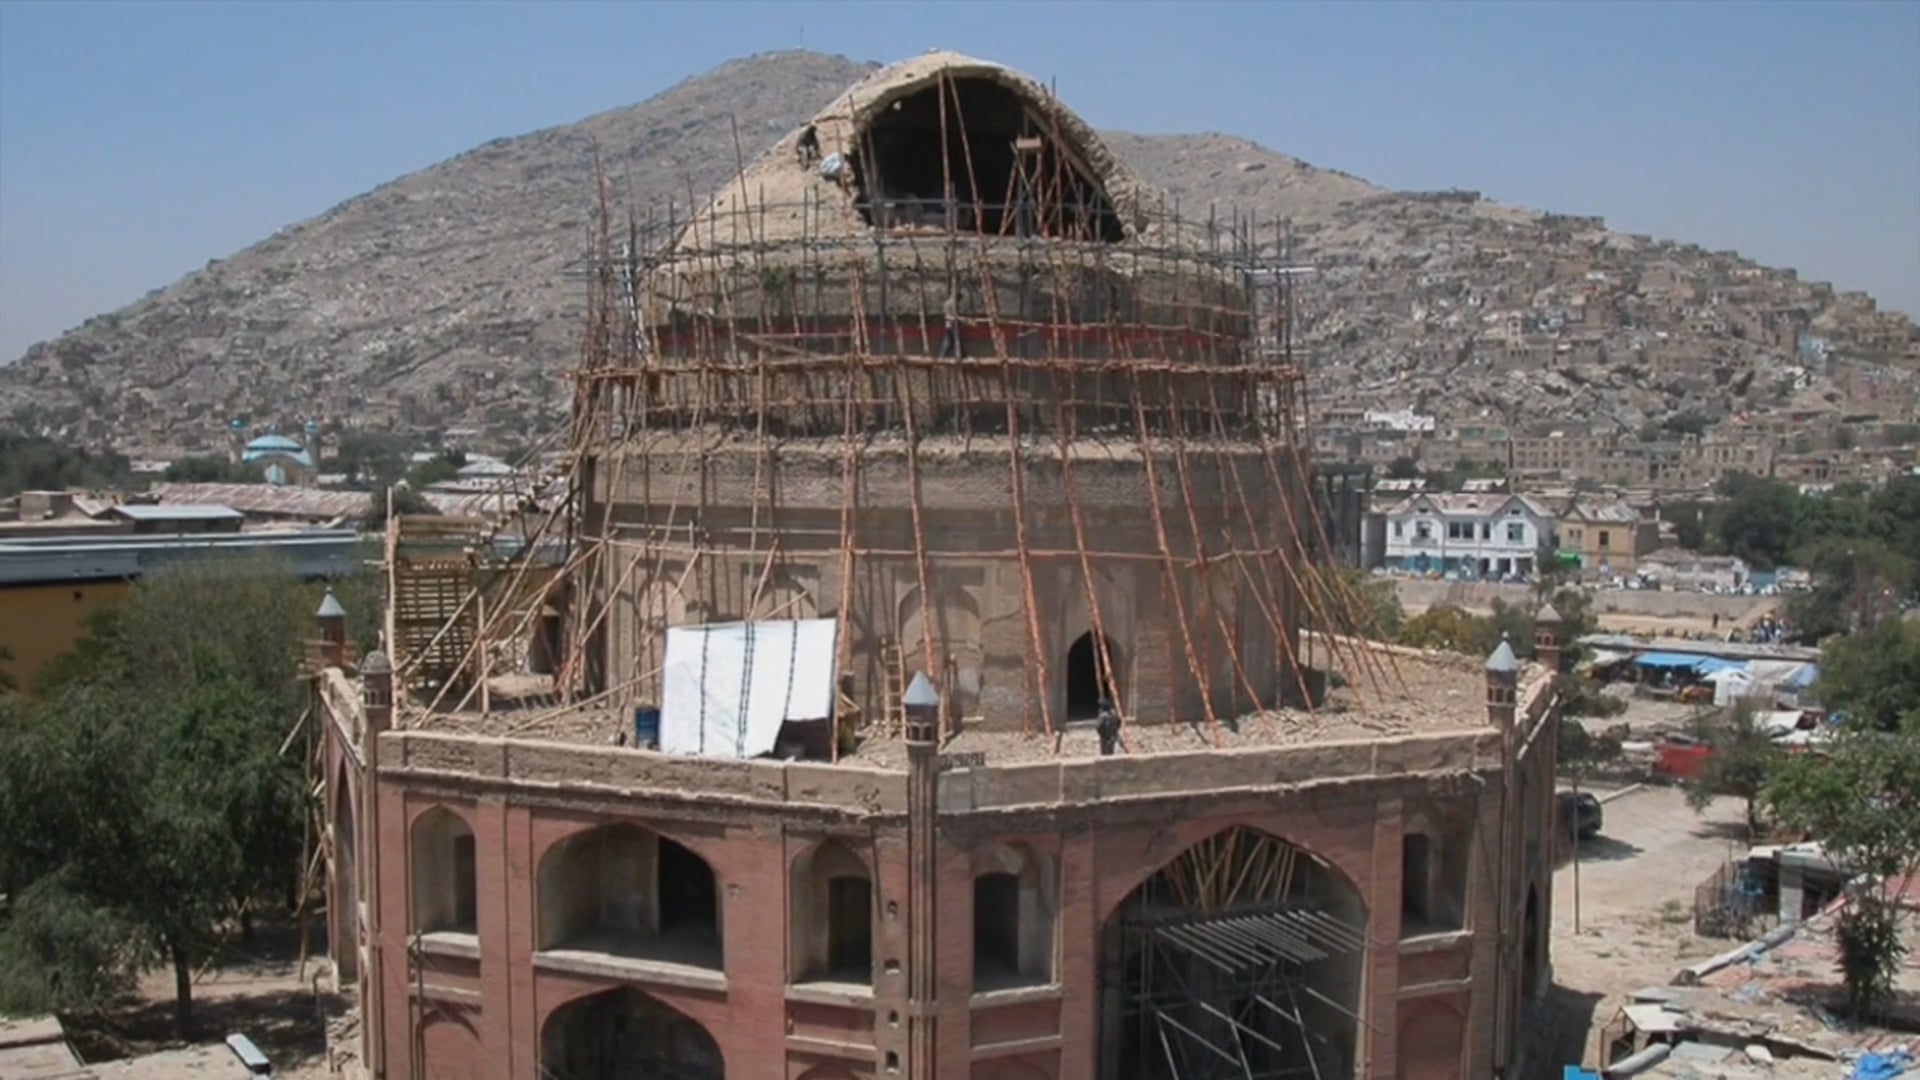 Afghanistan - Kaboul (Producteur : Sibomonde)